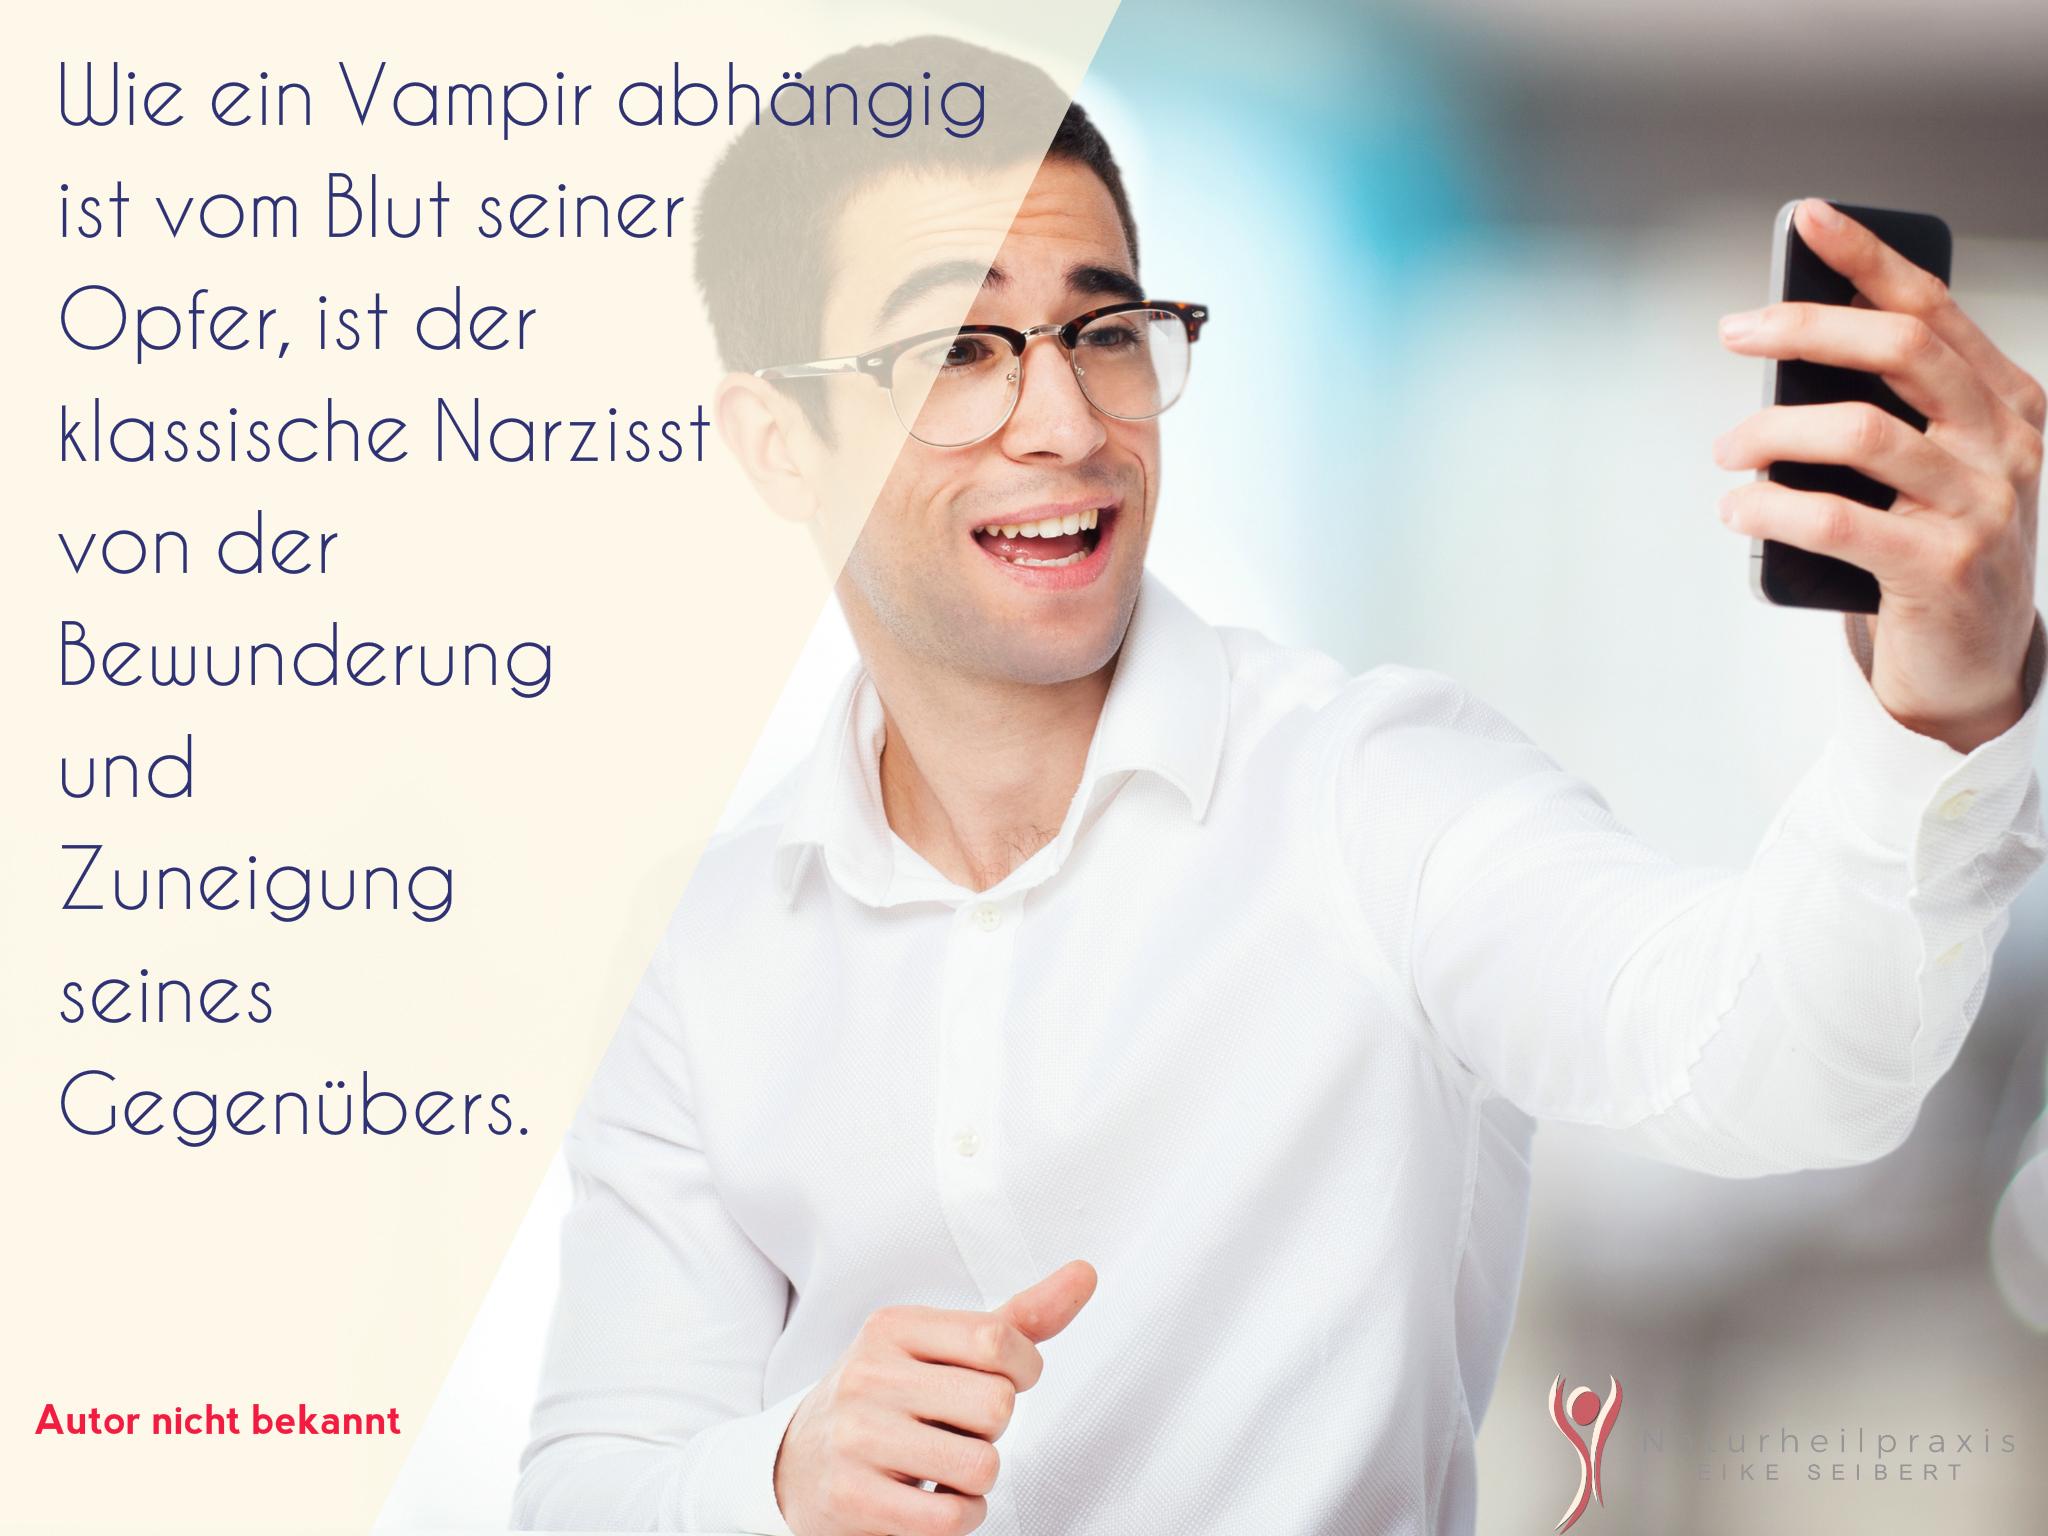 Narzissmus Beziehung Eike Seibert Landshut - Eike Seibert